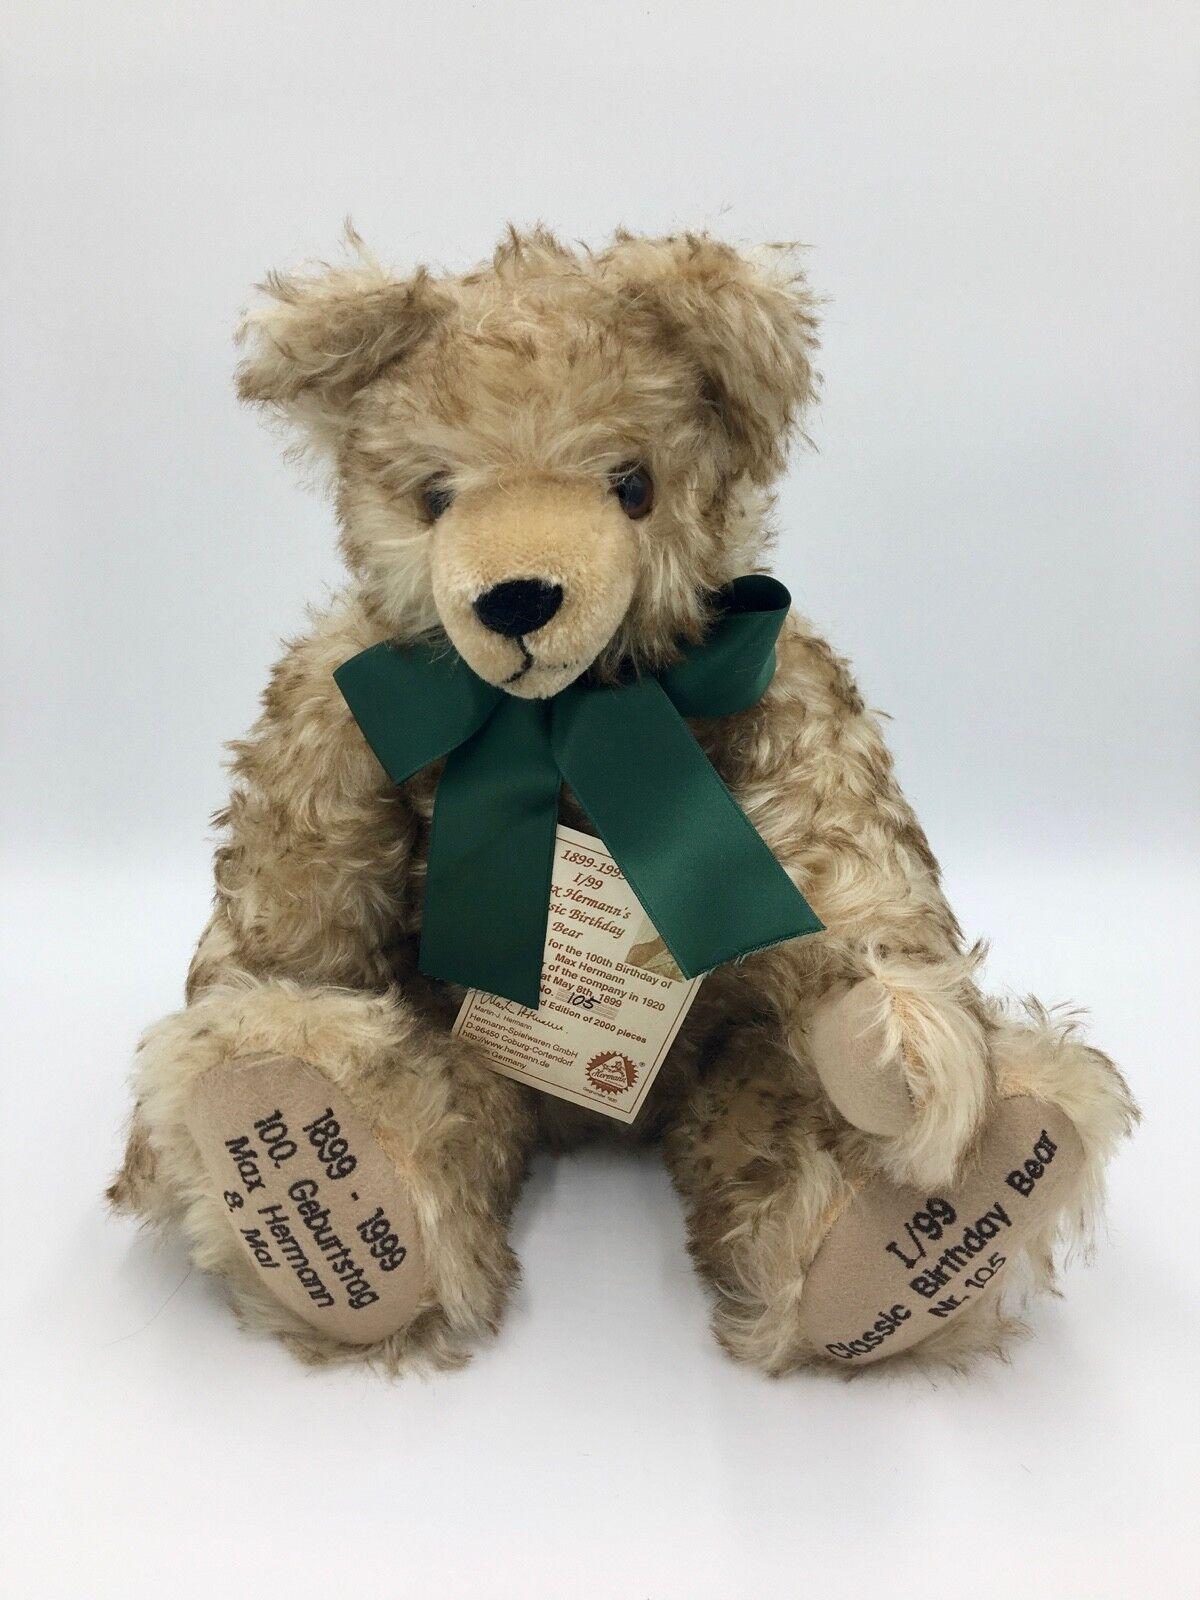 Collectable Teddy Bear 1899 1999 Max Hermann 100th Birthday Limited Edition